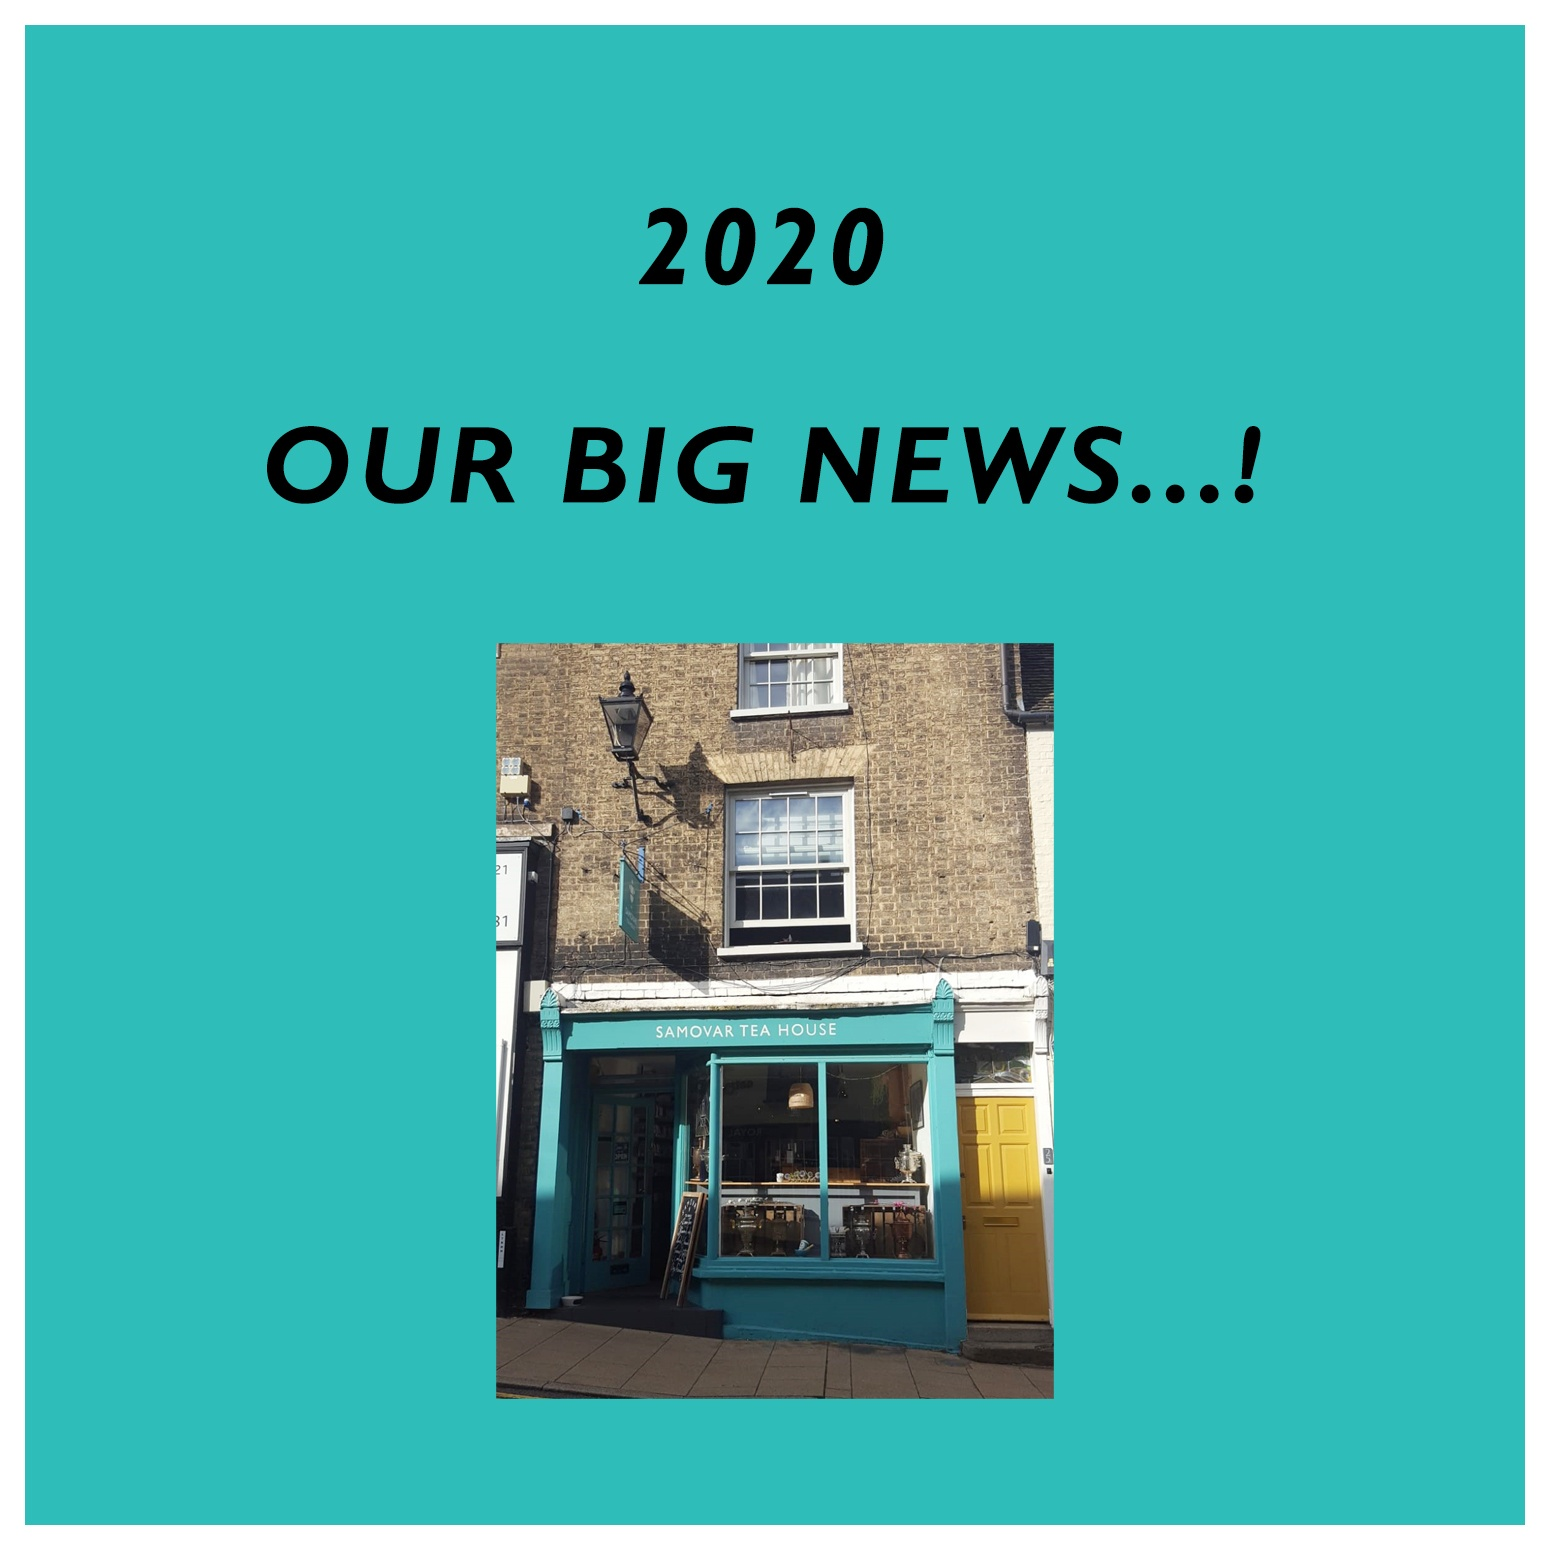 2020 - our big news!